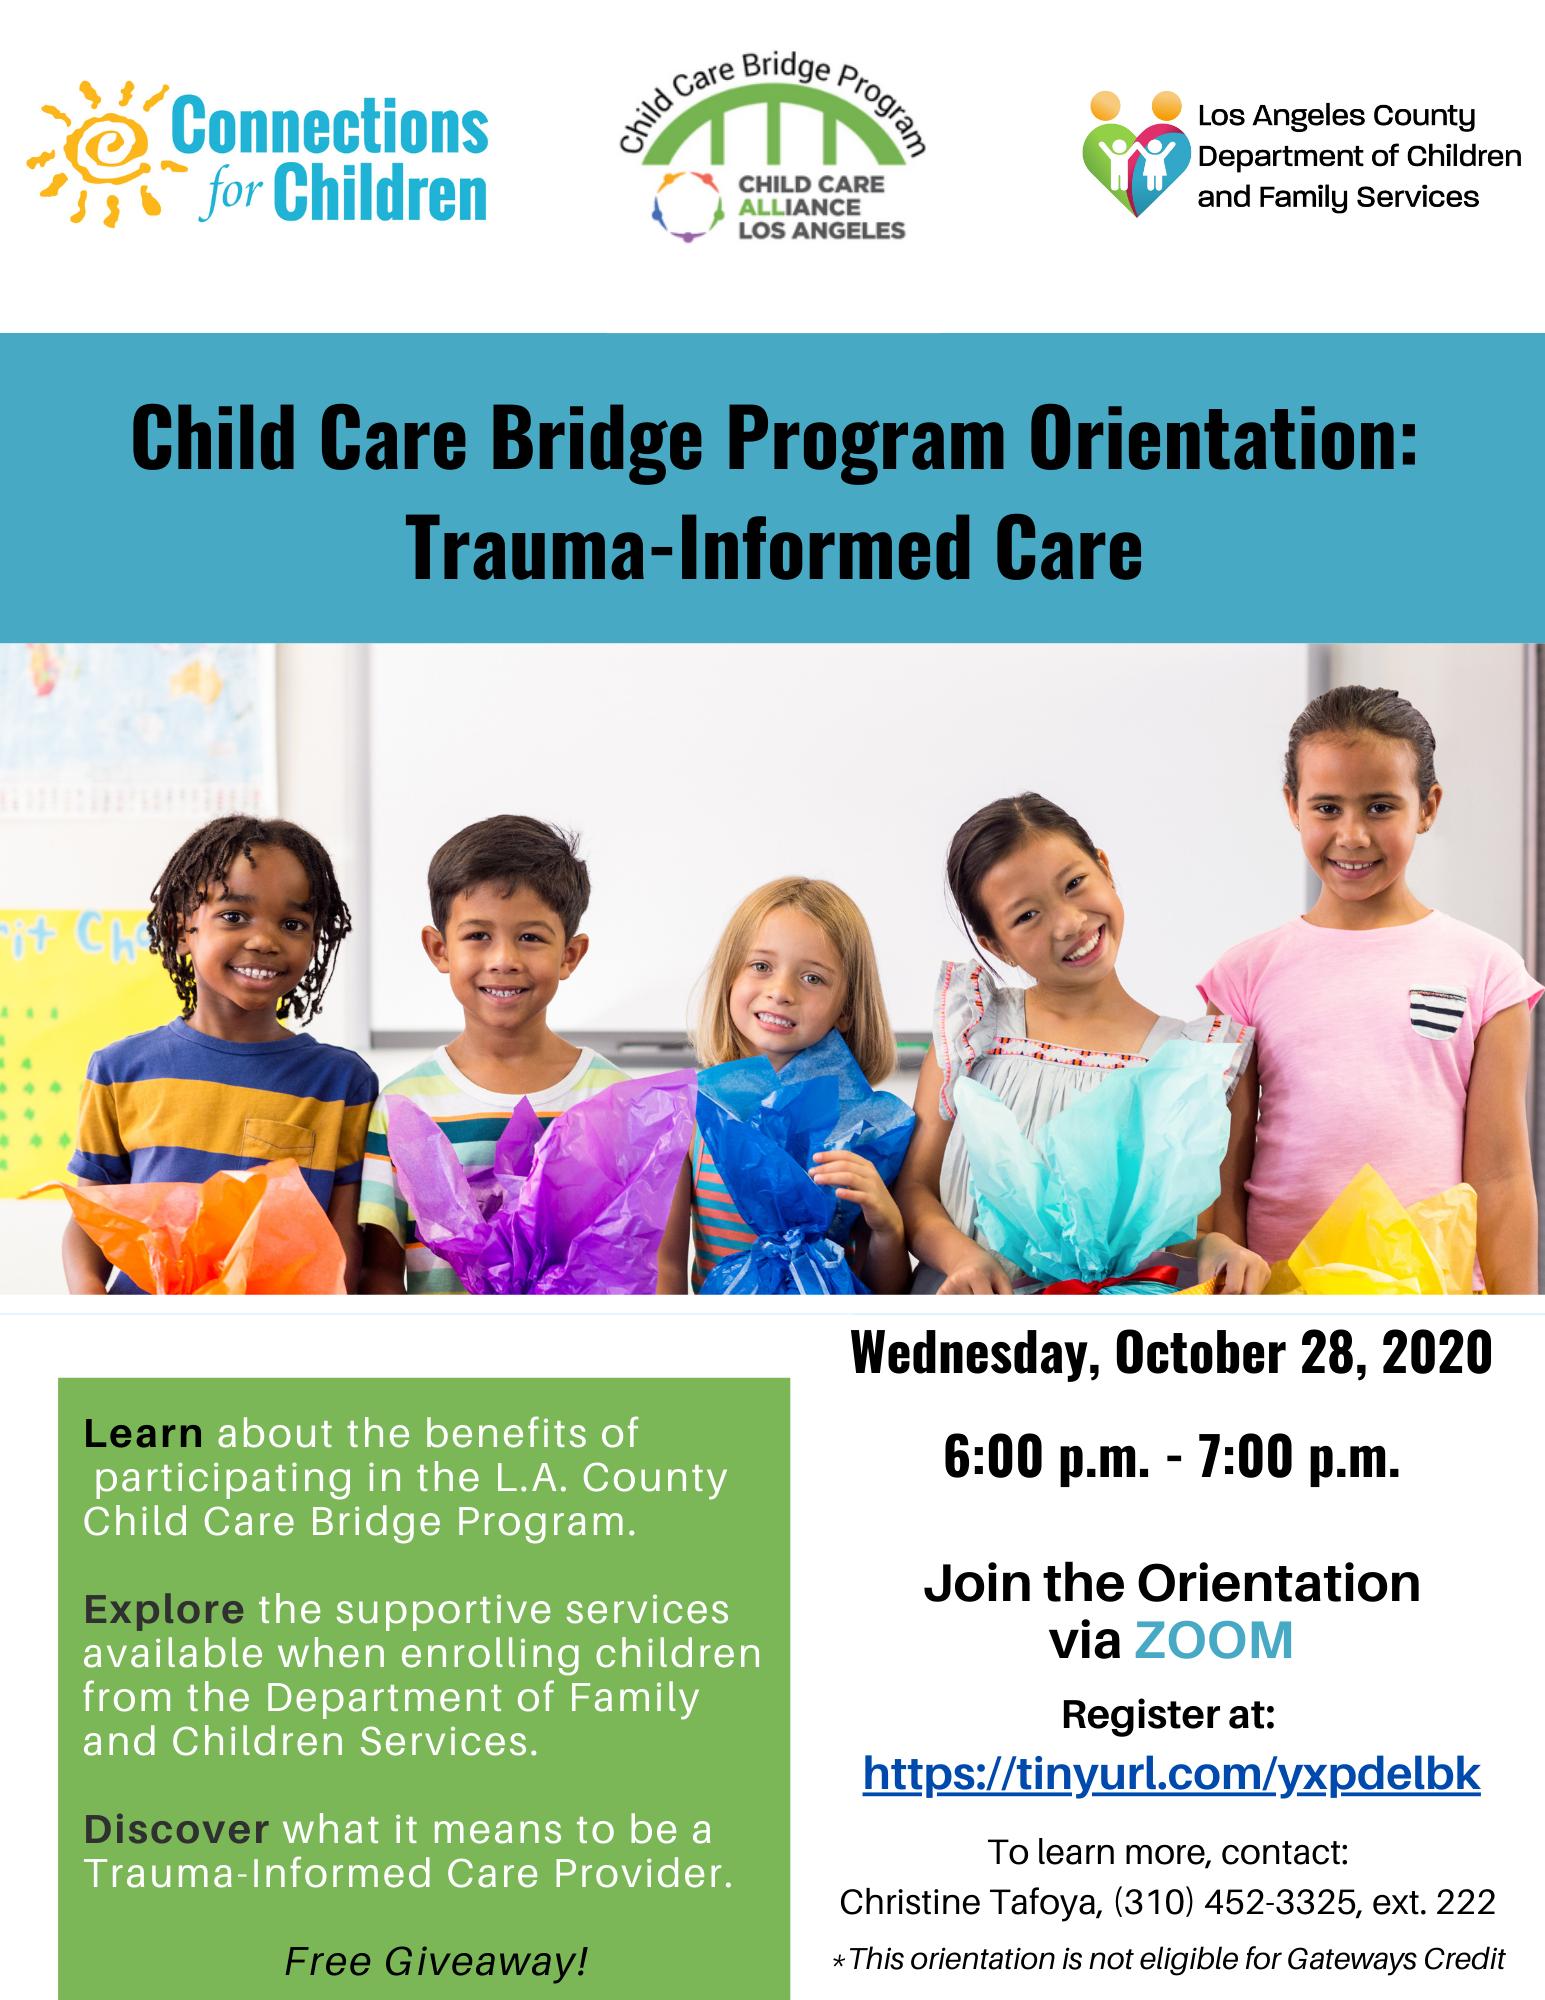 Child Care Bridge Program Orientation